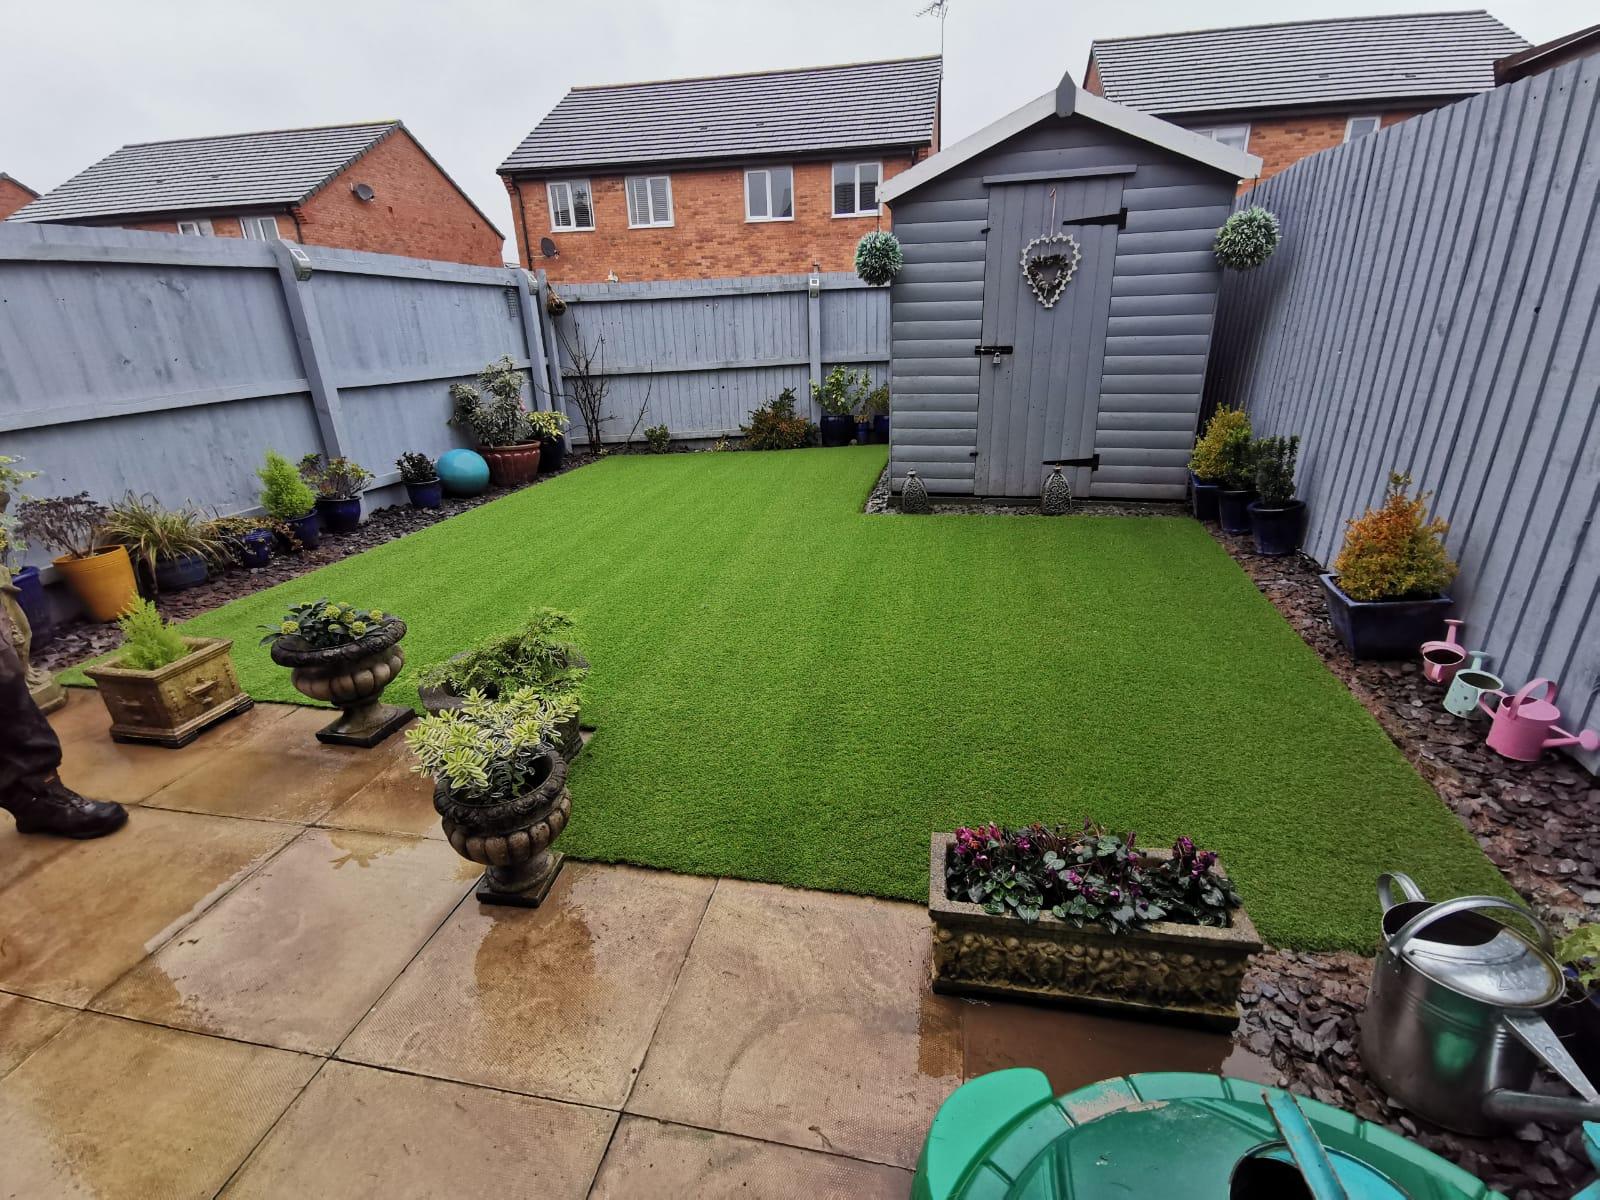 New build garden with artificial grass.